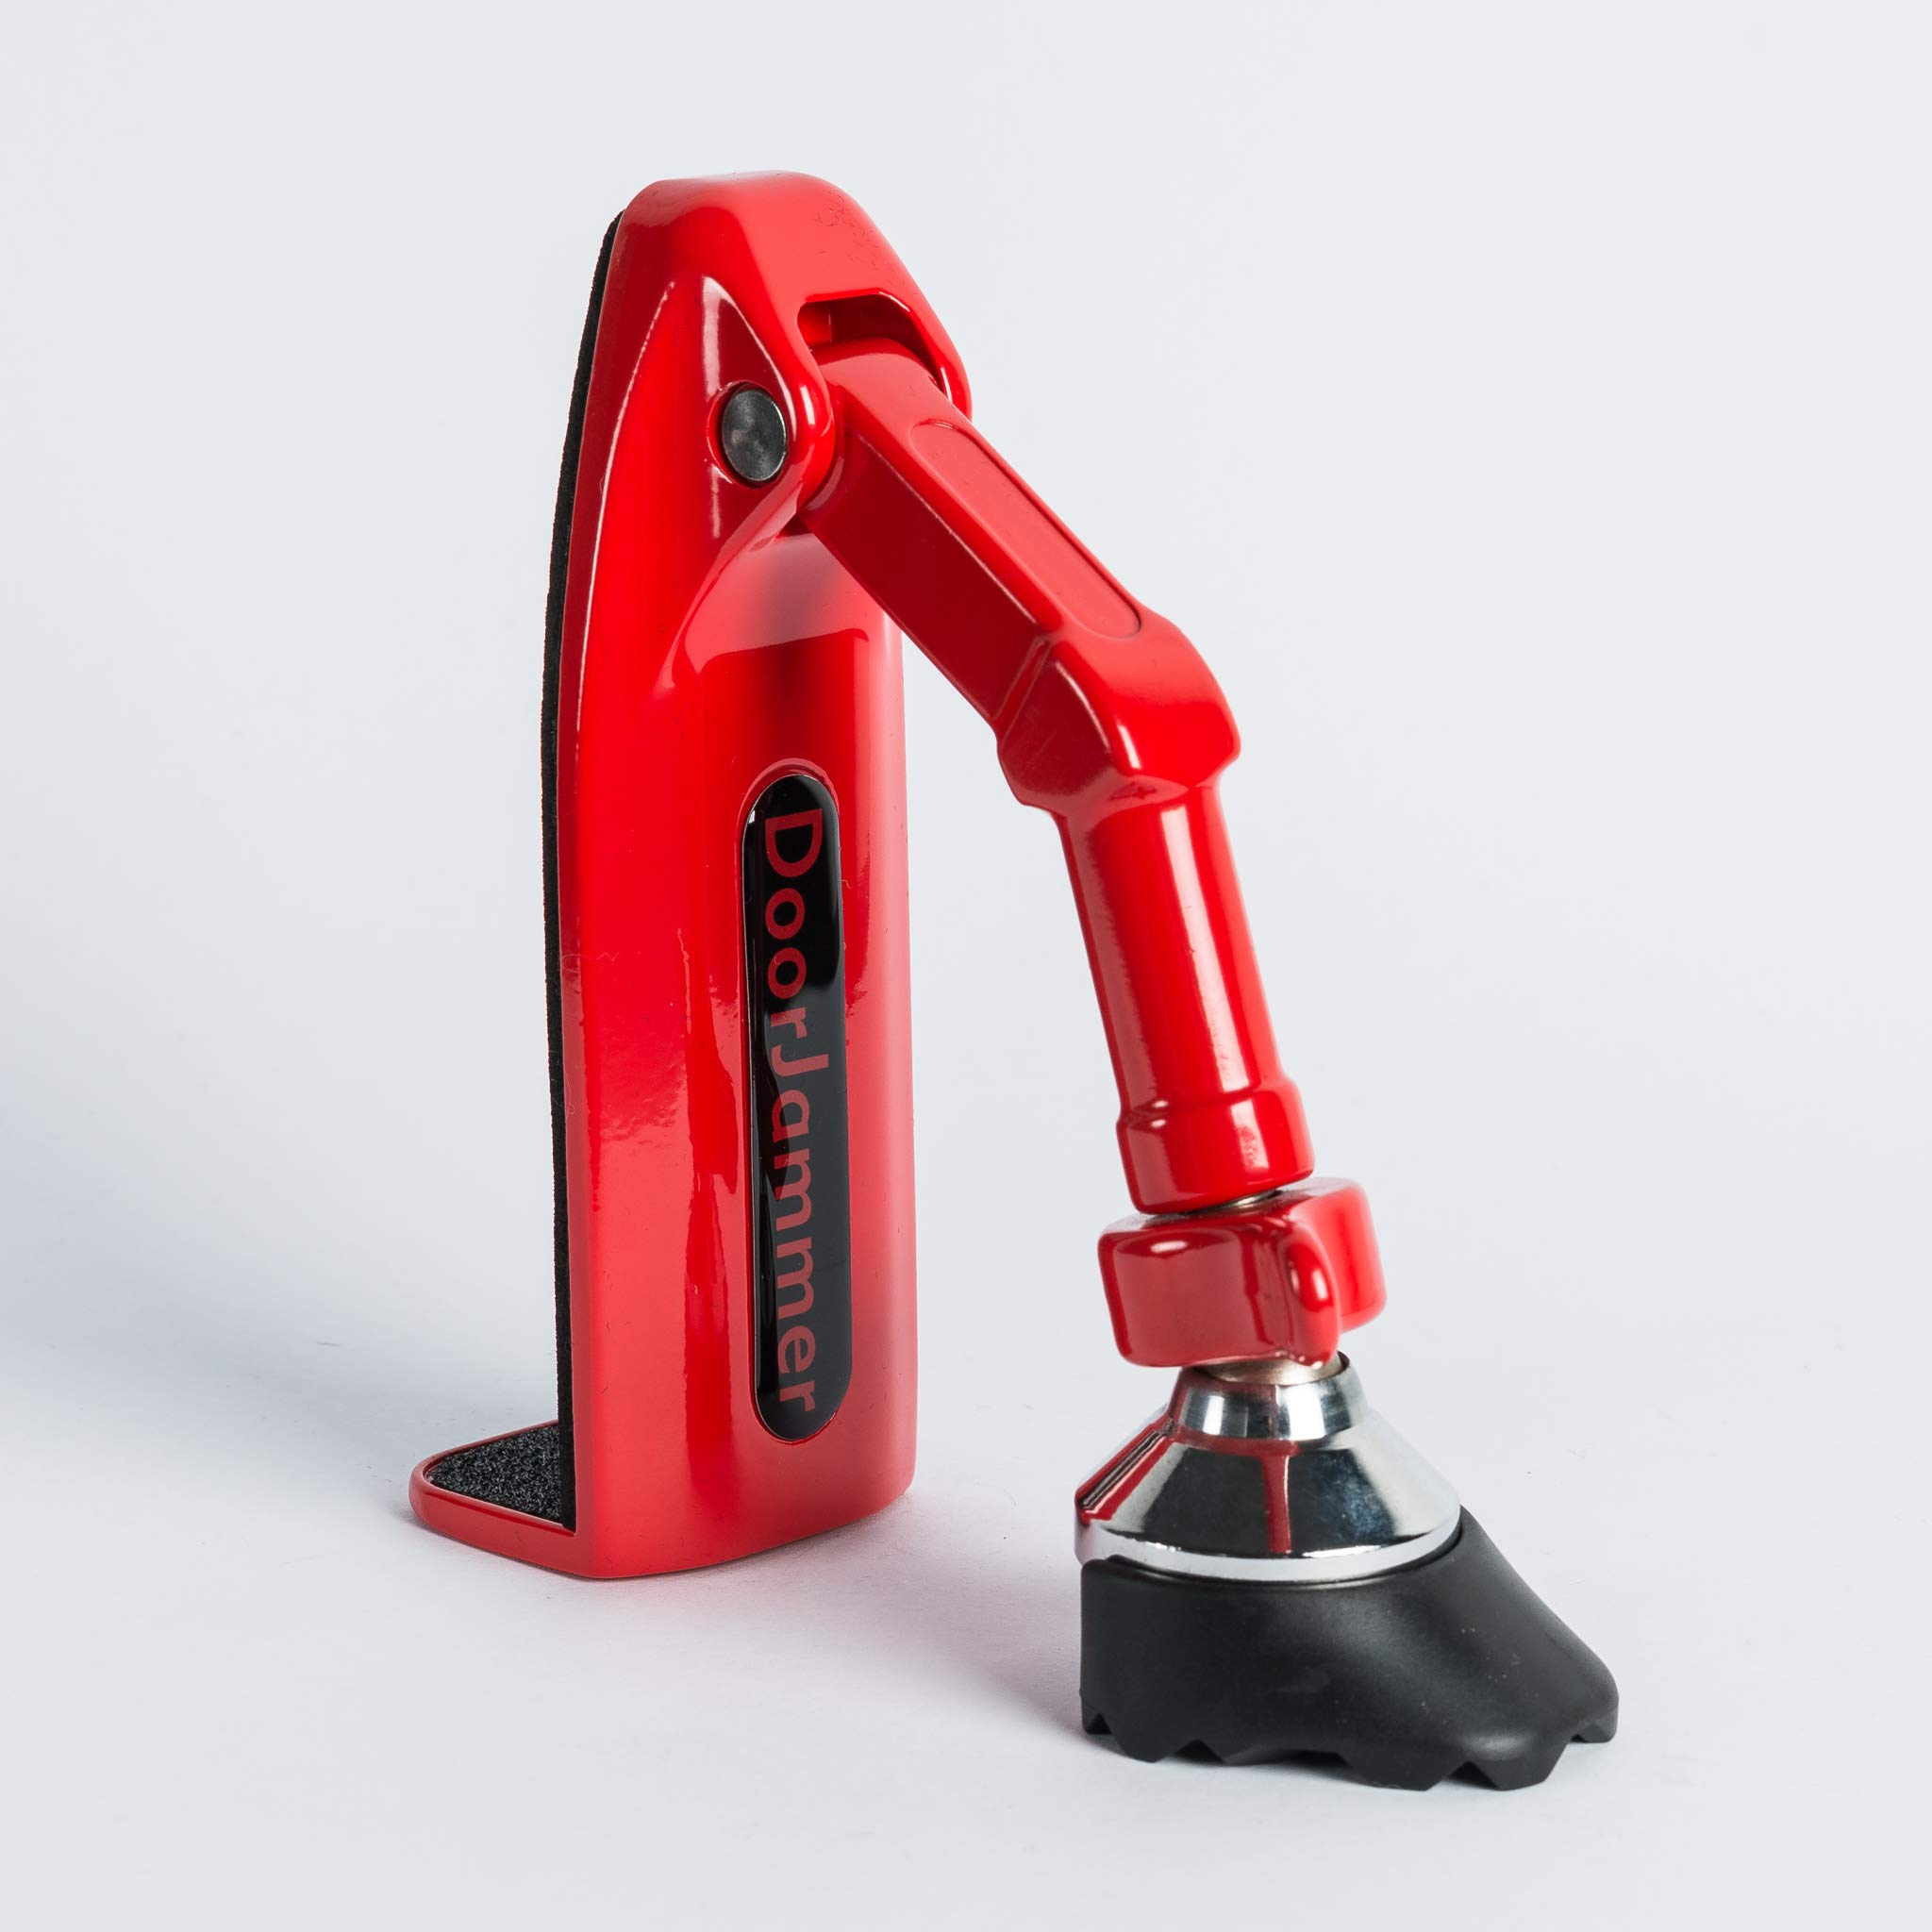 KH Security 370169 Kit de seguridad para el hogar, Rojo, Plata product image